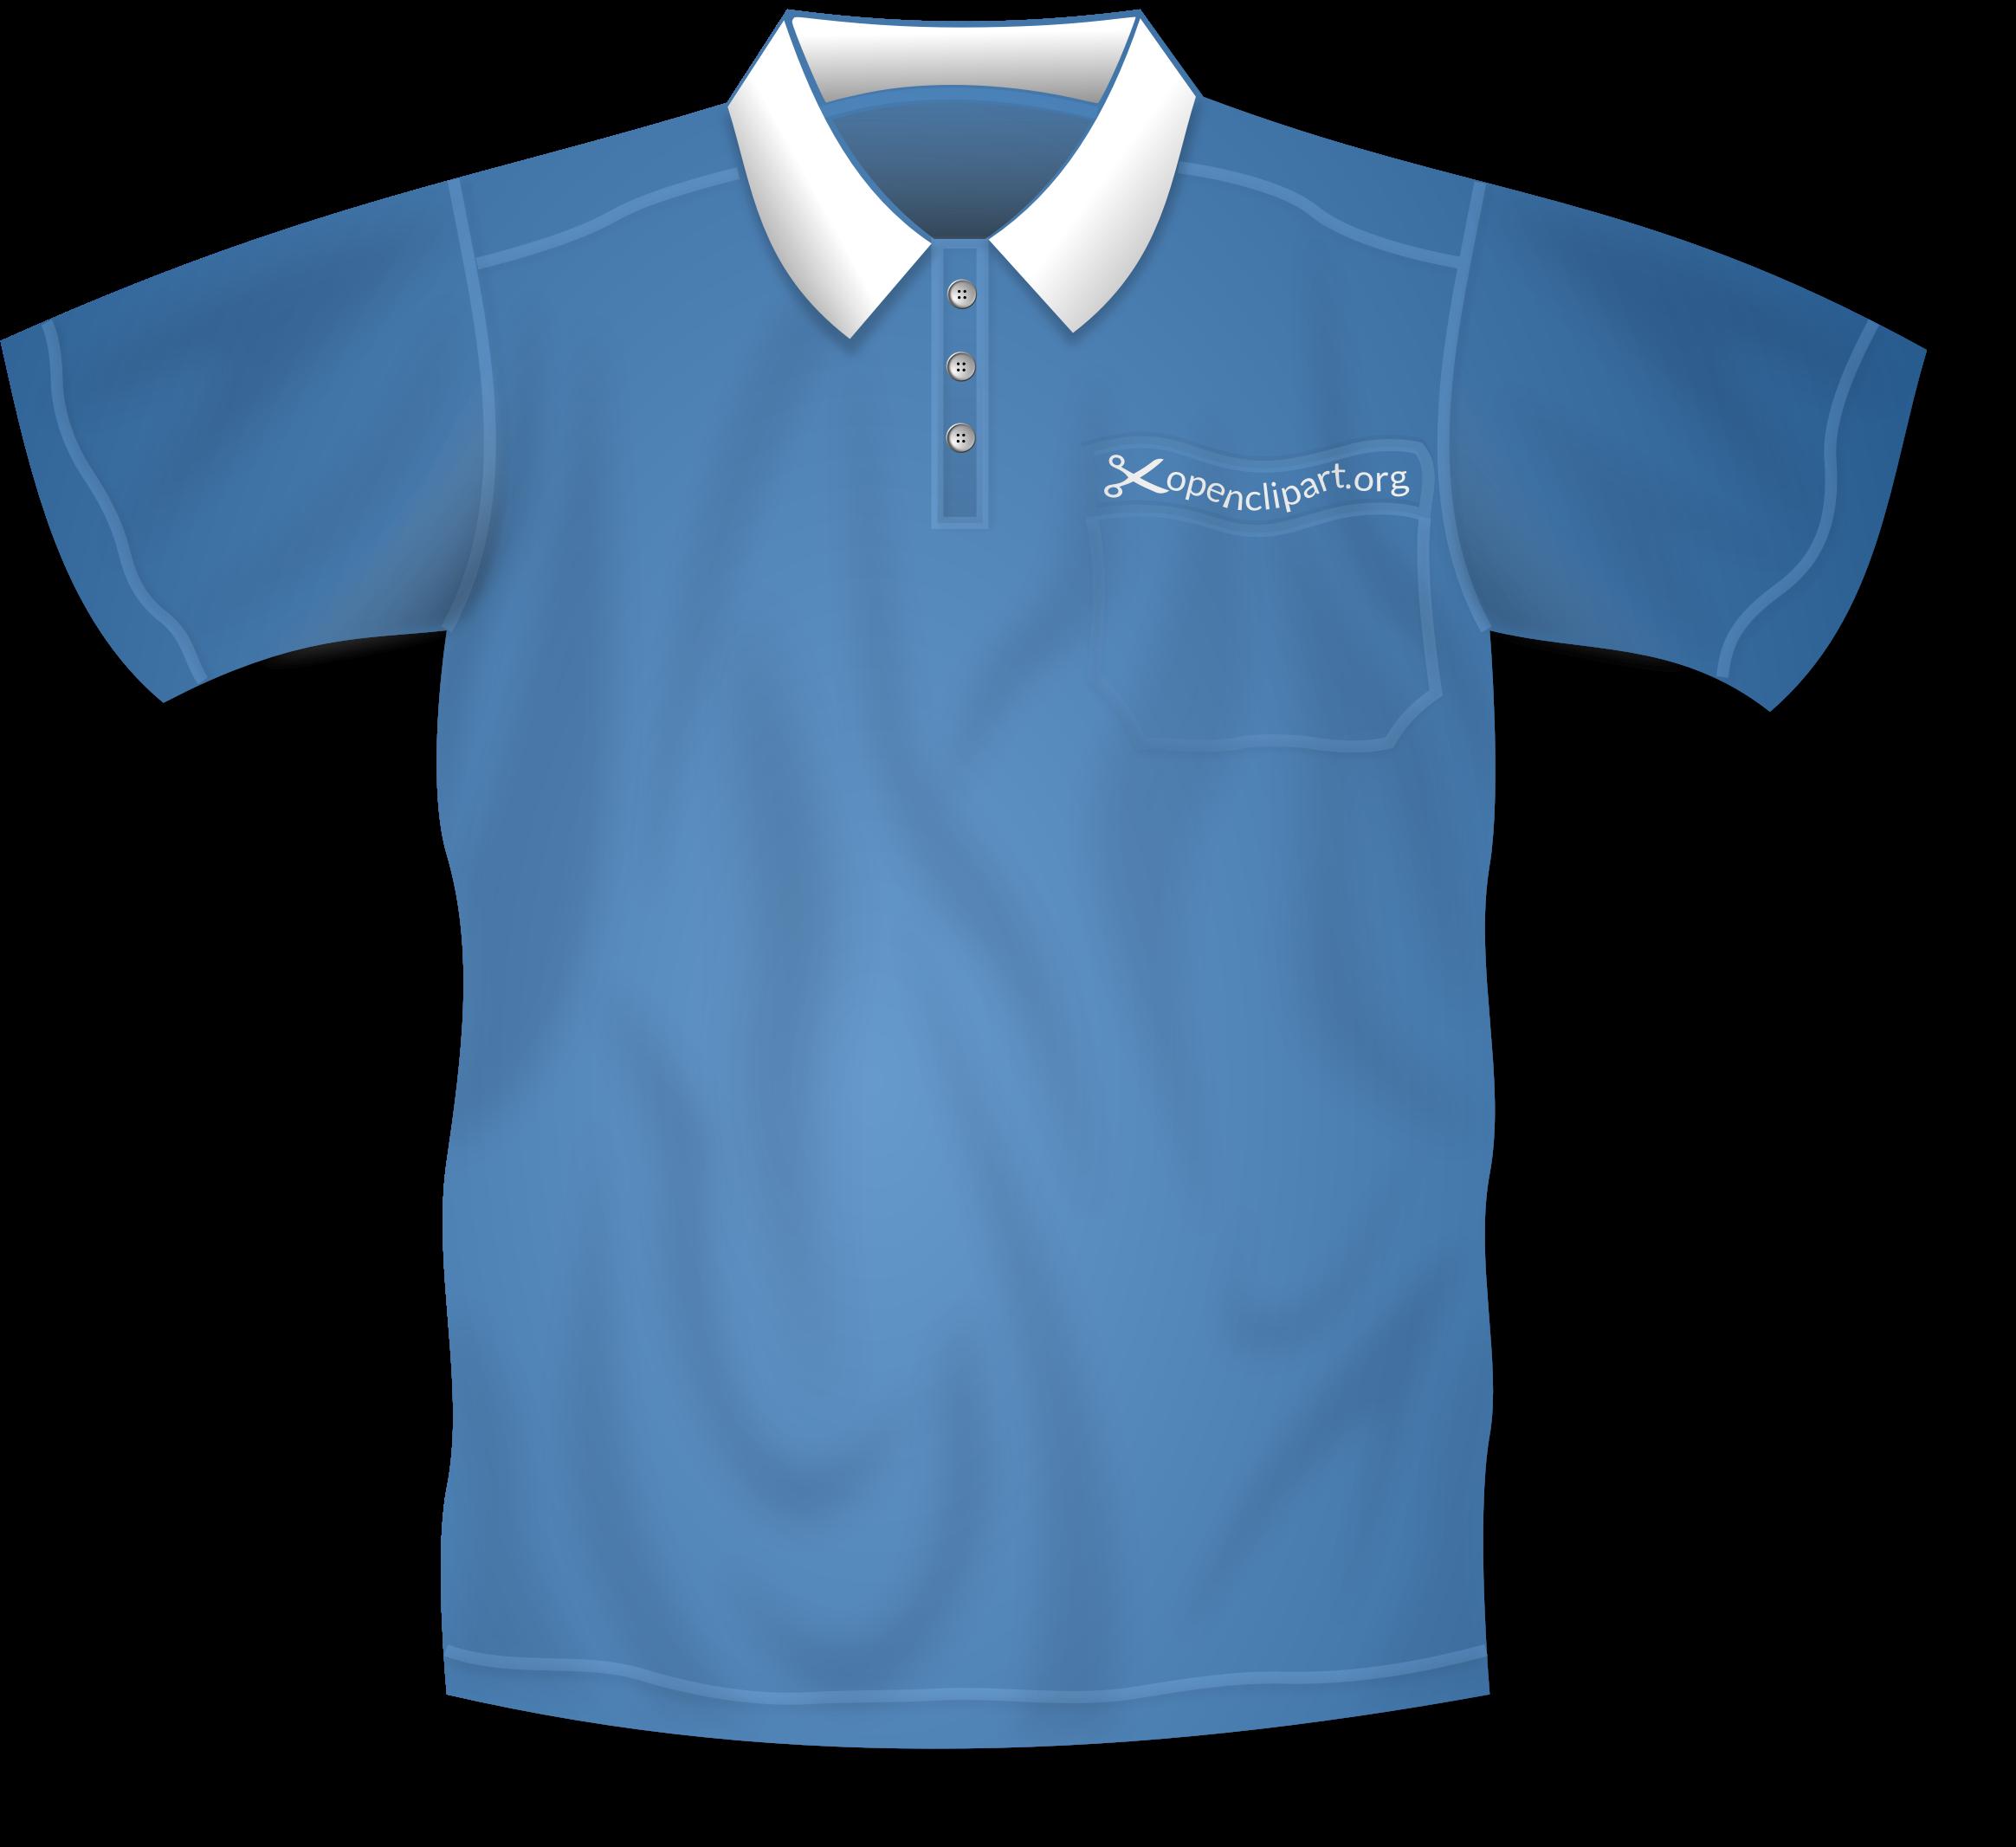 Download Polo Shirt Png Clipart HQ PNG Image | FreePNGImg